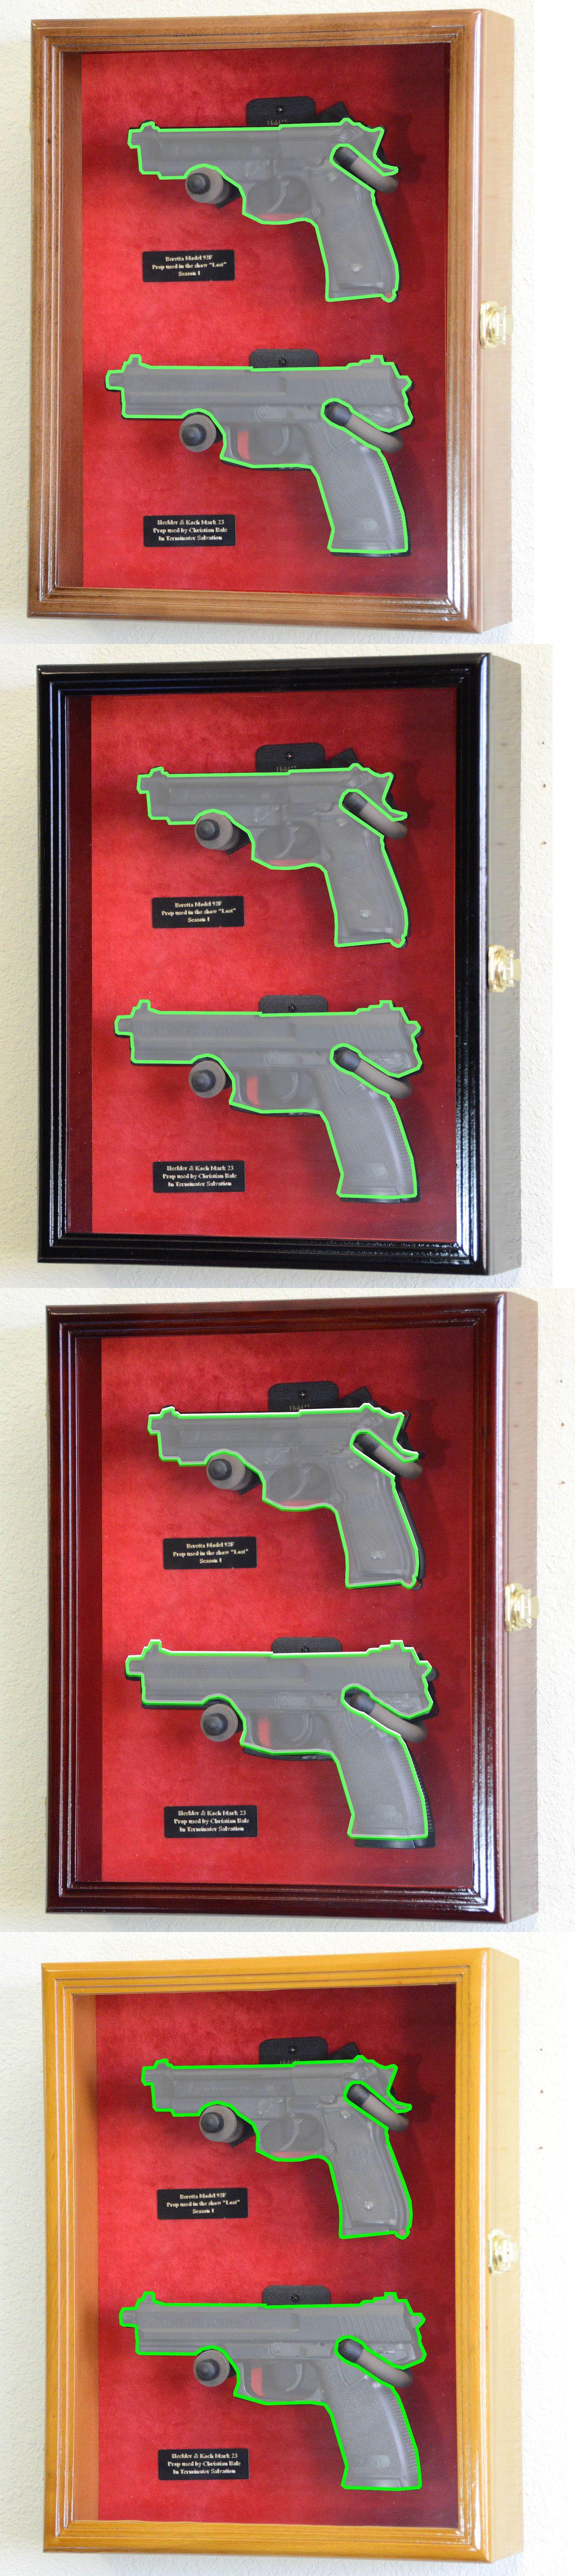 Double pistol handgun revolver gun display case cabinet rack shadowbox - Shadow Boxes 41512 Large Double Pistol Handgun Revolver Gun Display Case Cabinet Rack Shadowbox